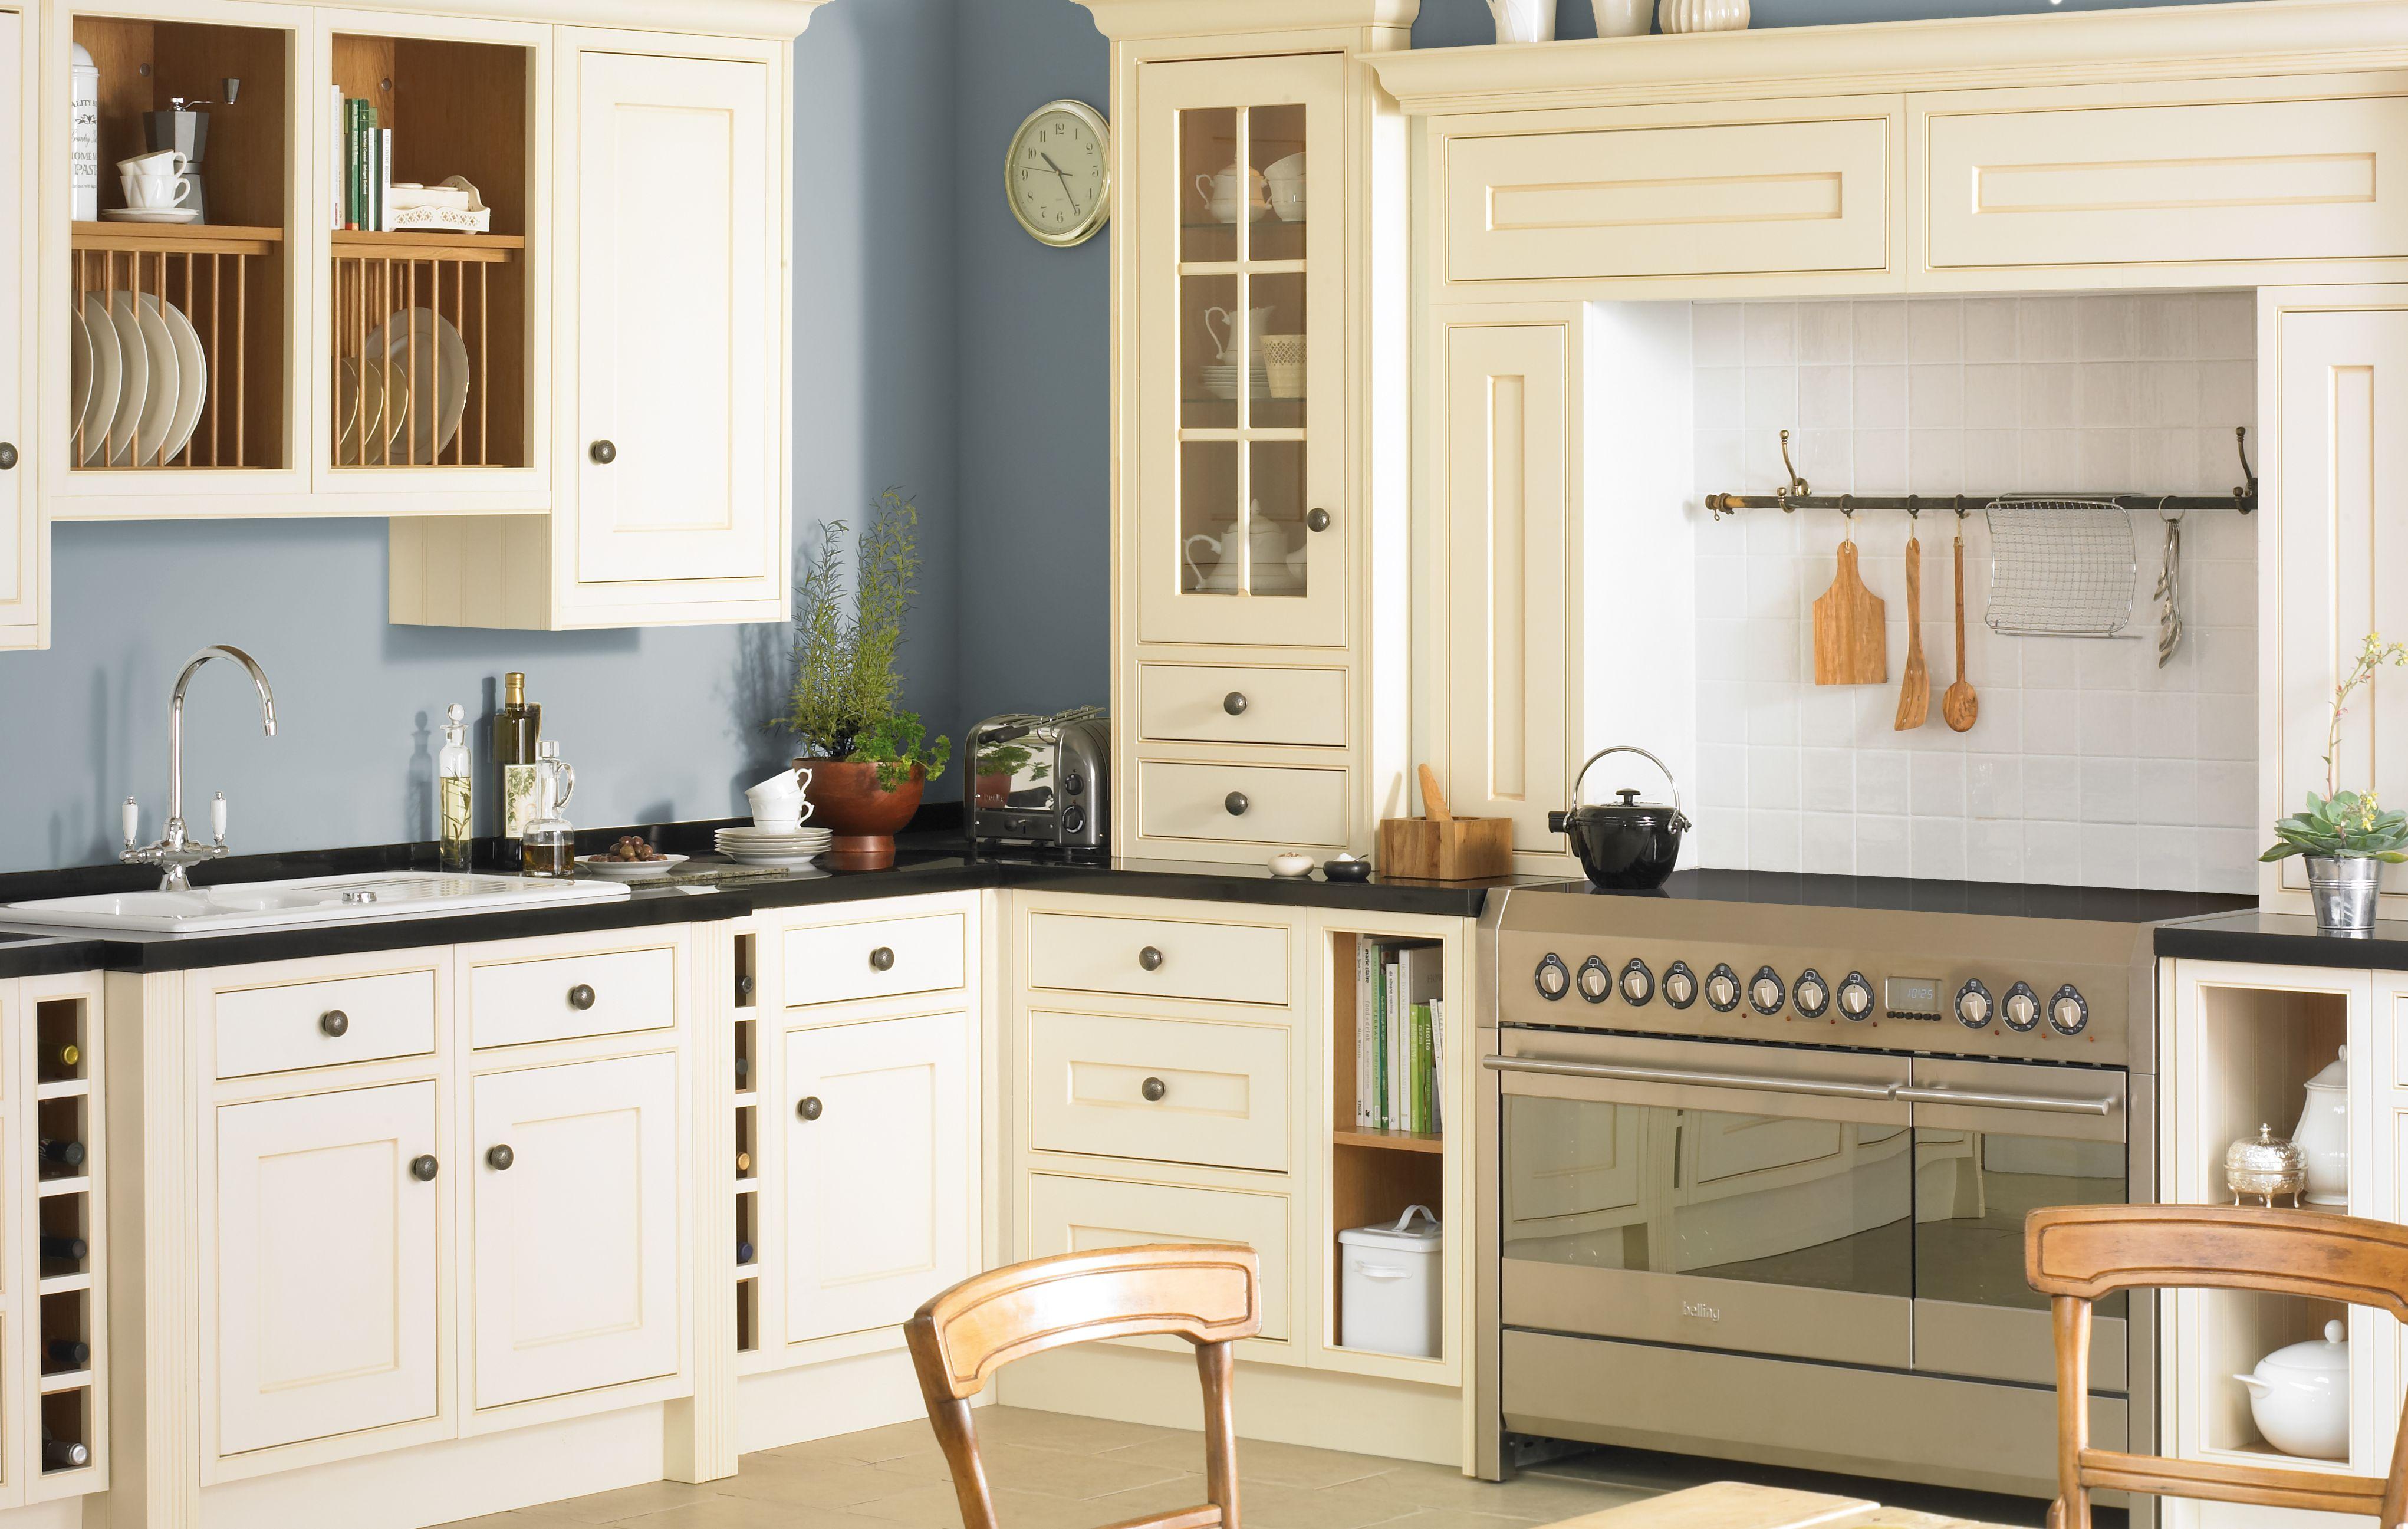 vintage kitchen design ideas help ideas diy at b q cooke lewis woburn framed kitchen